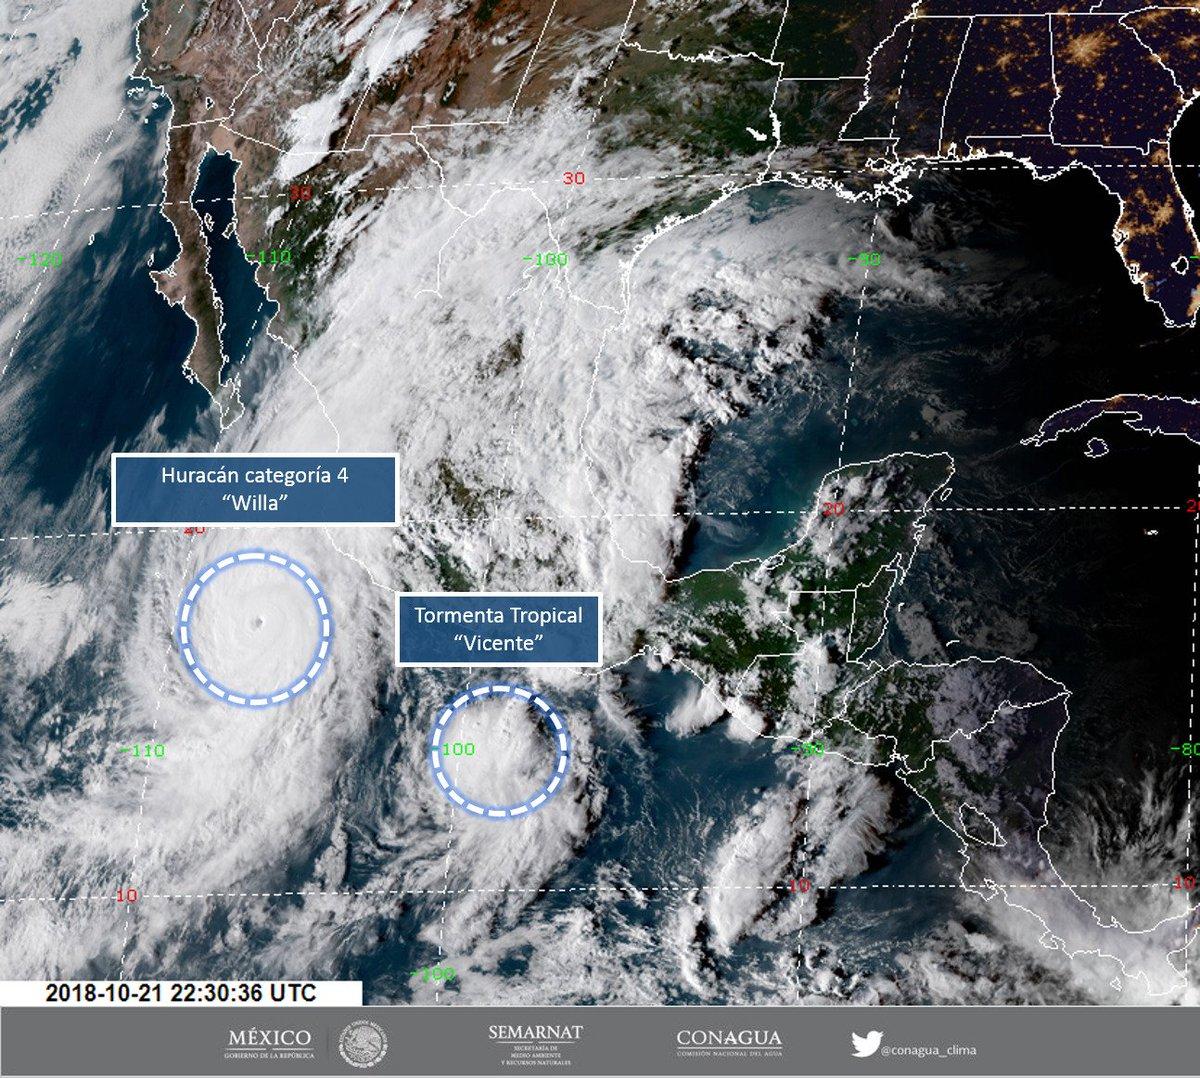 ¡Increíble, casi todo México tapado!  RT @conagua_clima:   #Huracán #Willa de categoría 4 y #TormentaTropical #Vicente en el Océano #Pacífico https://t.co/FveKbDyjGA